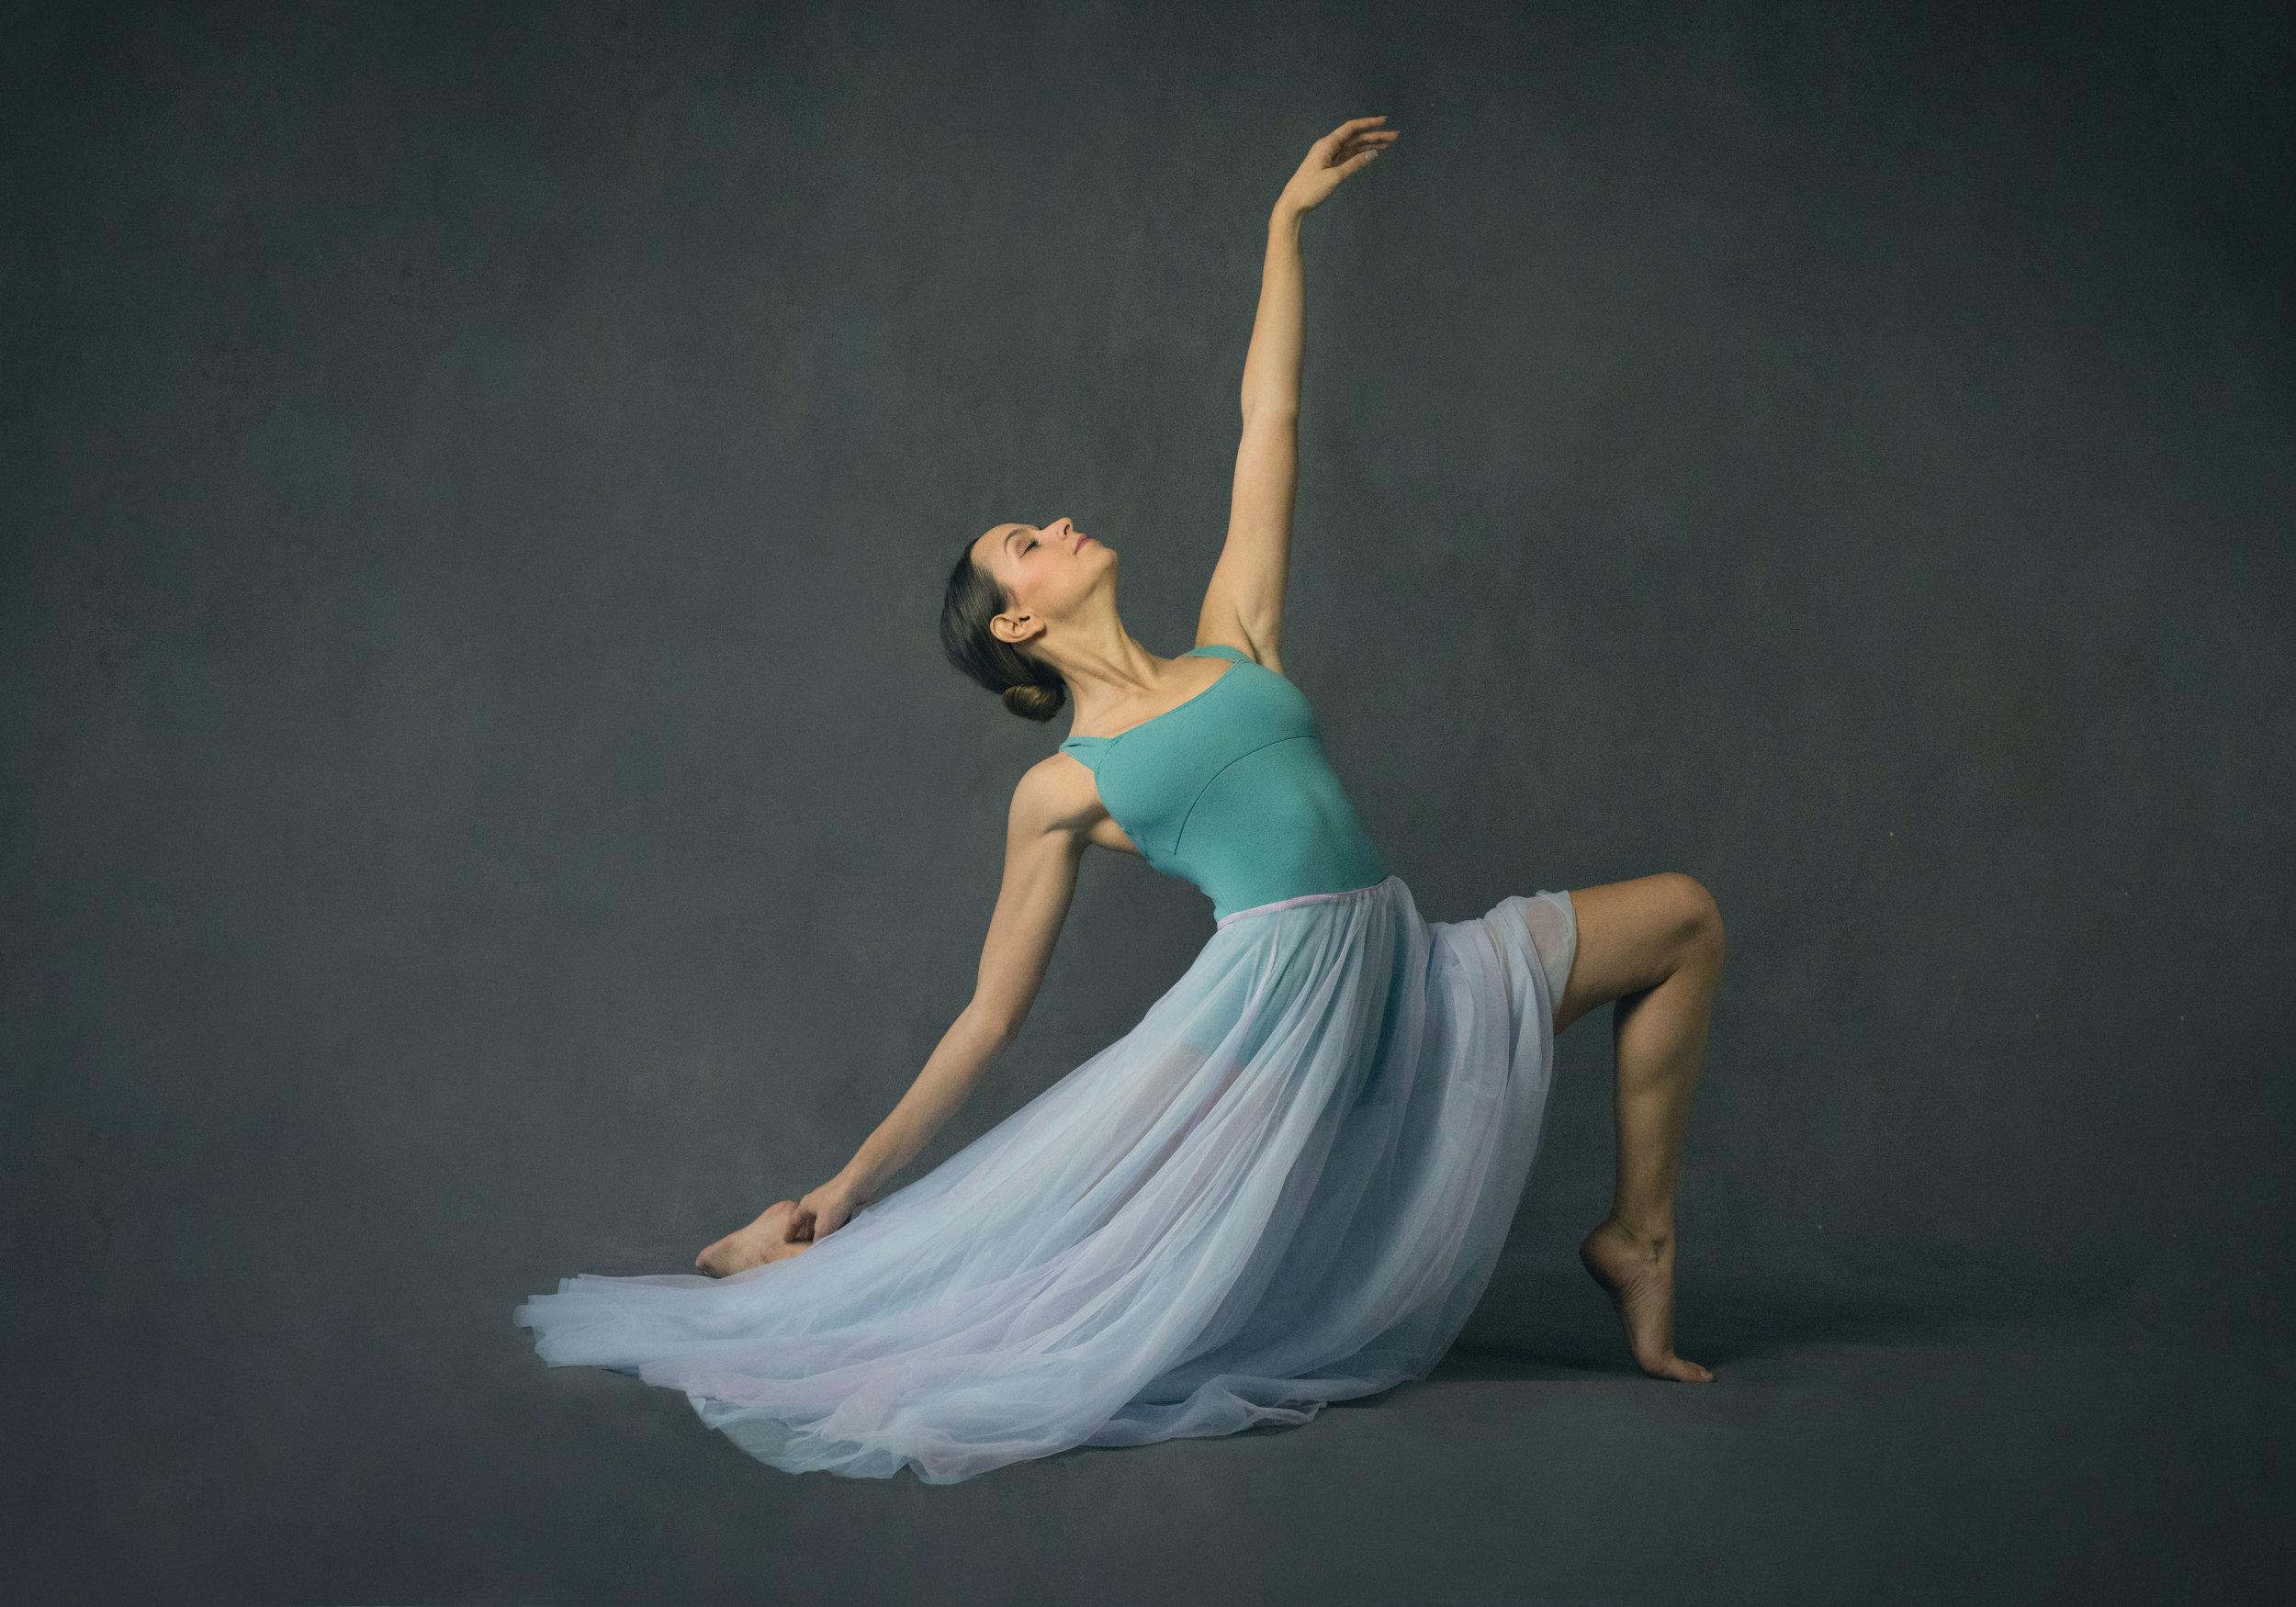 Dancer in a Flowing Skirt